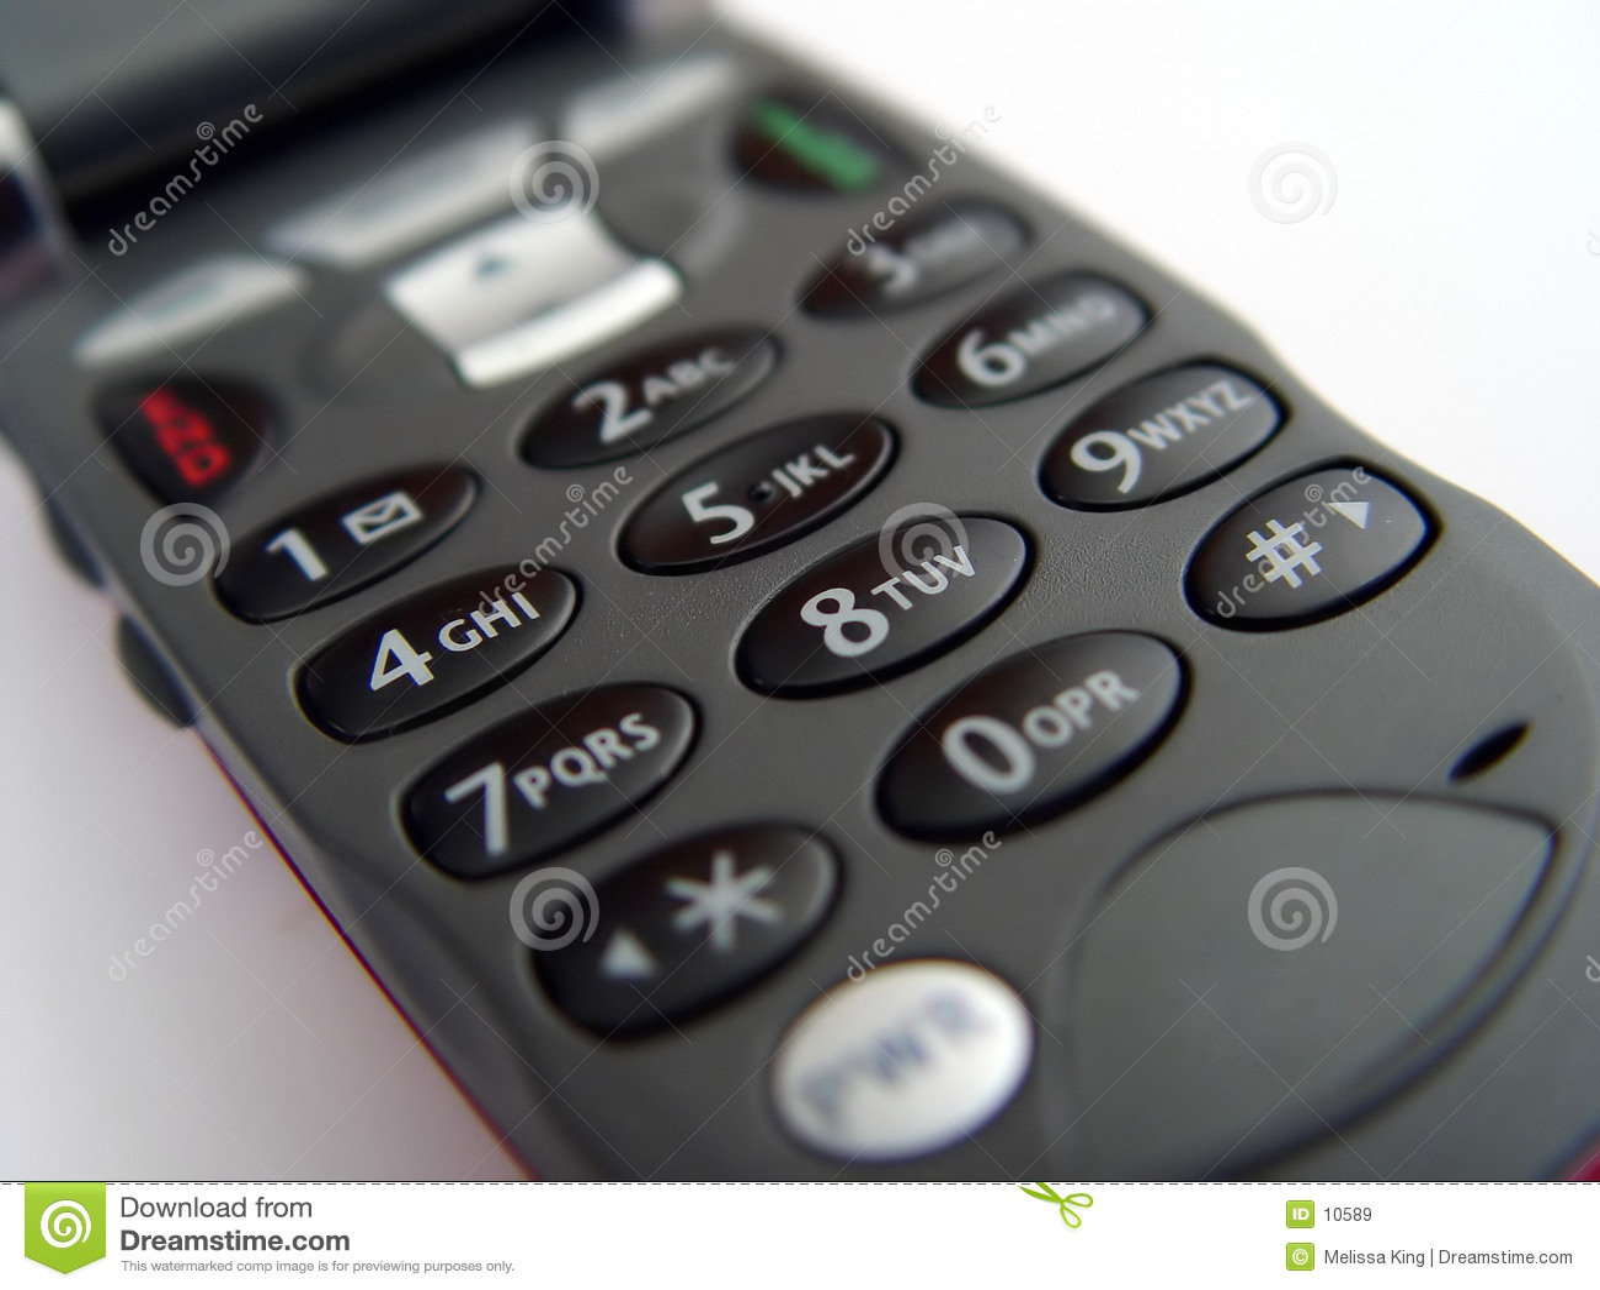 Cellular Phone Keypad